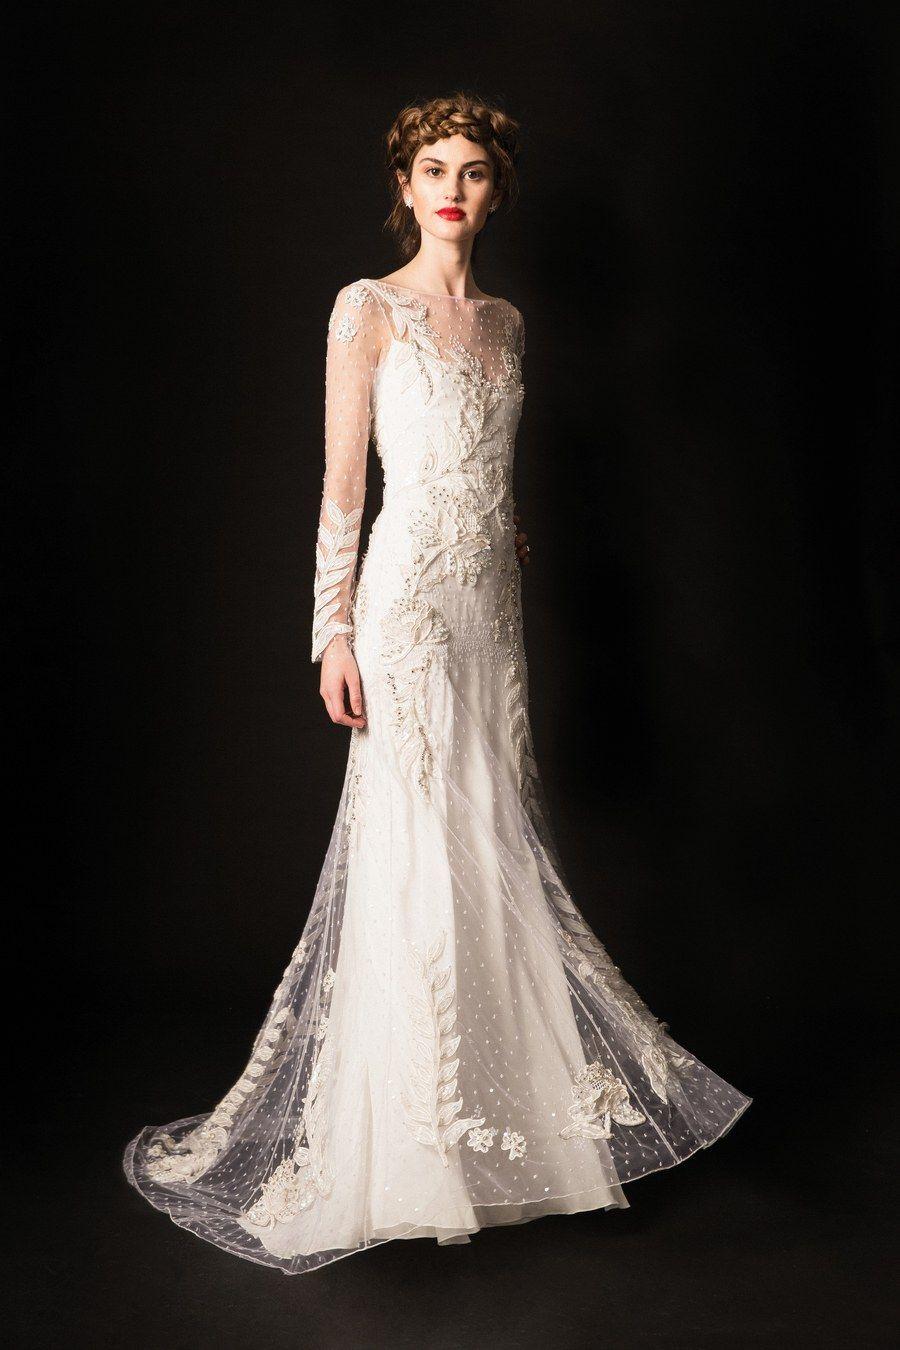 738a333d2c0 Temperley London Bridal Spring 2020 Fashion Show in 2019